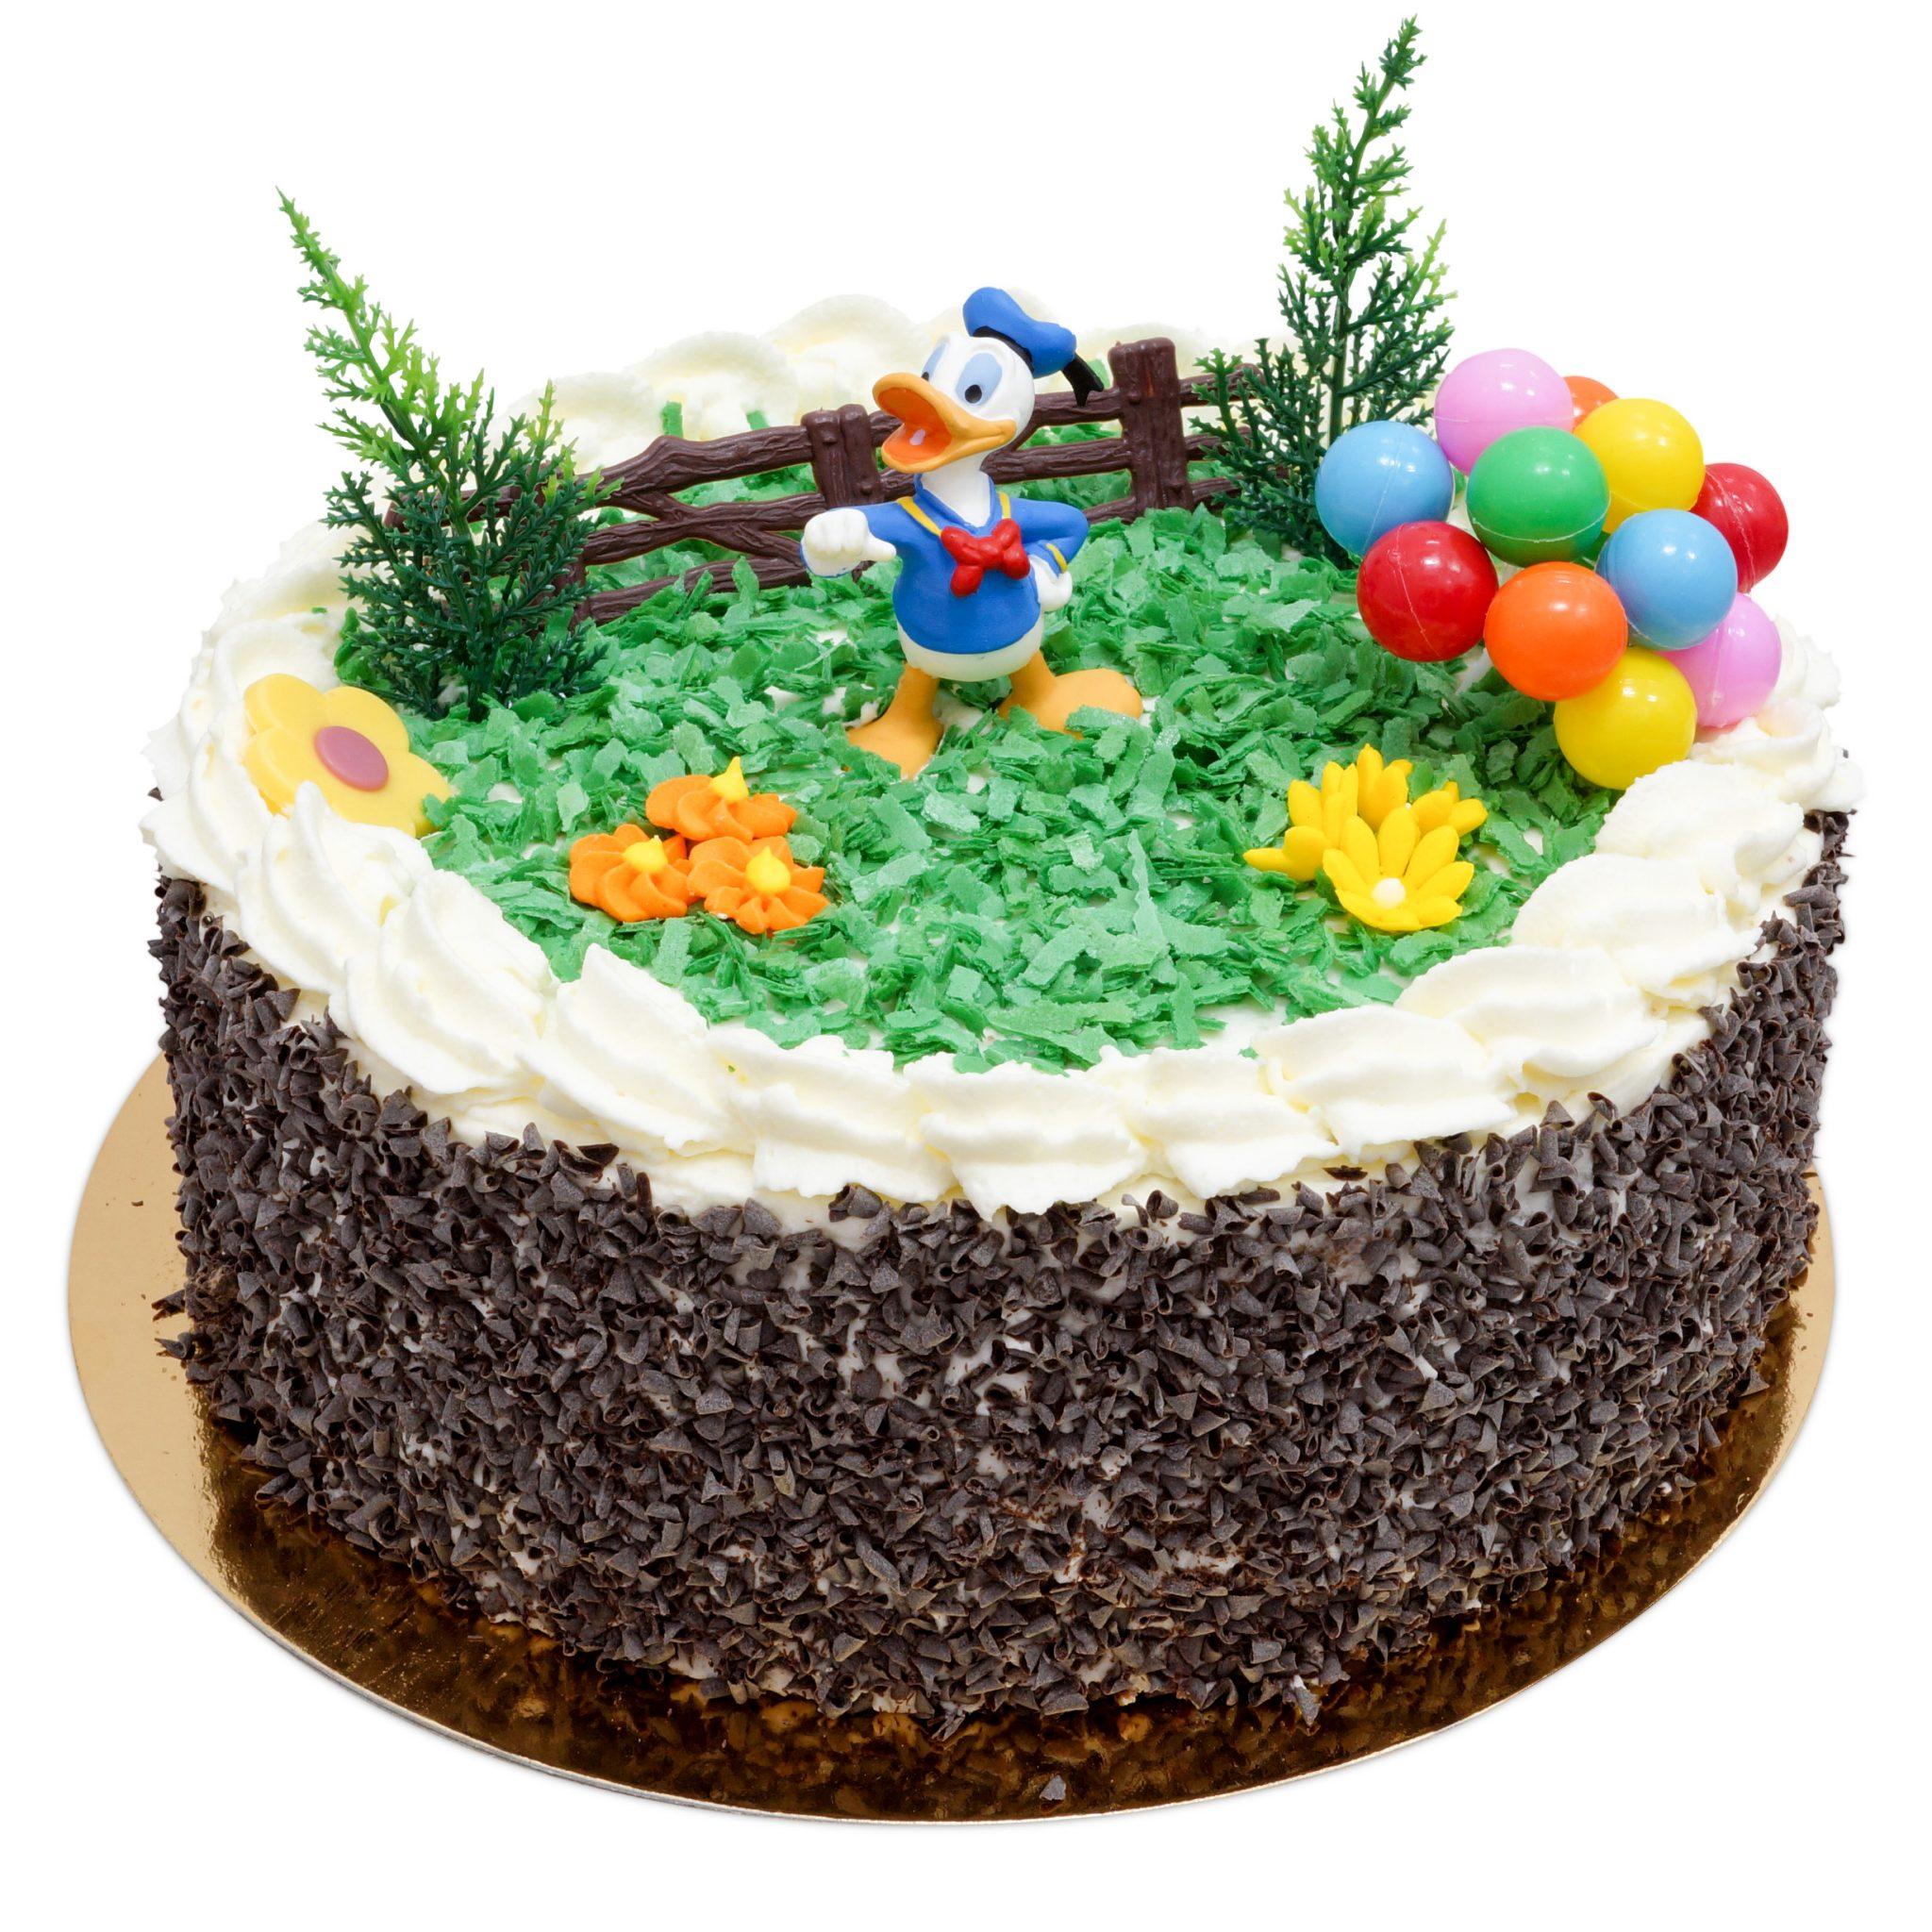 tort z kaczorem donaldem